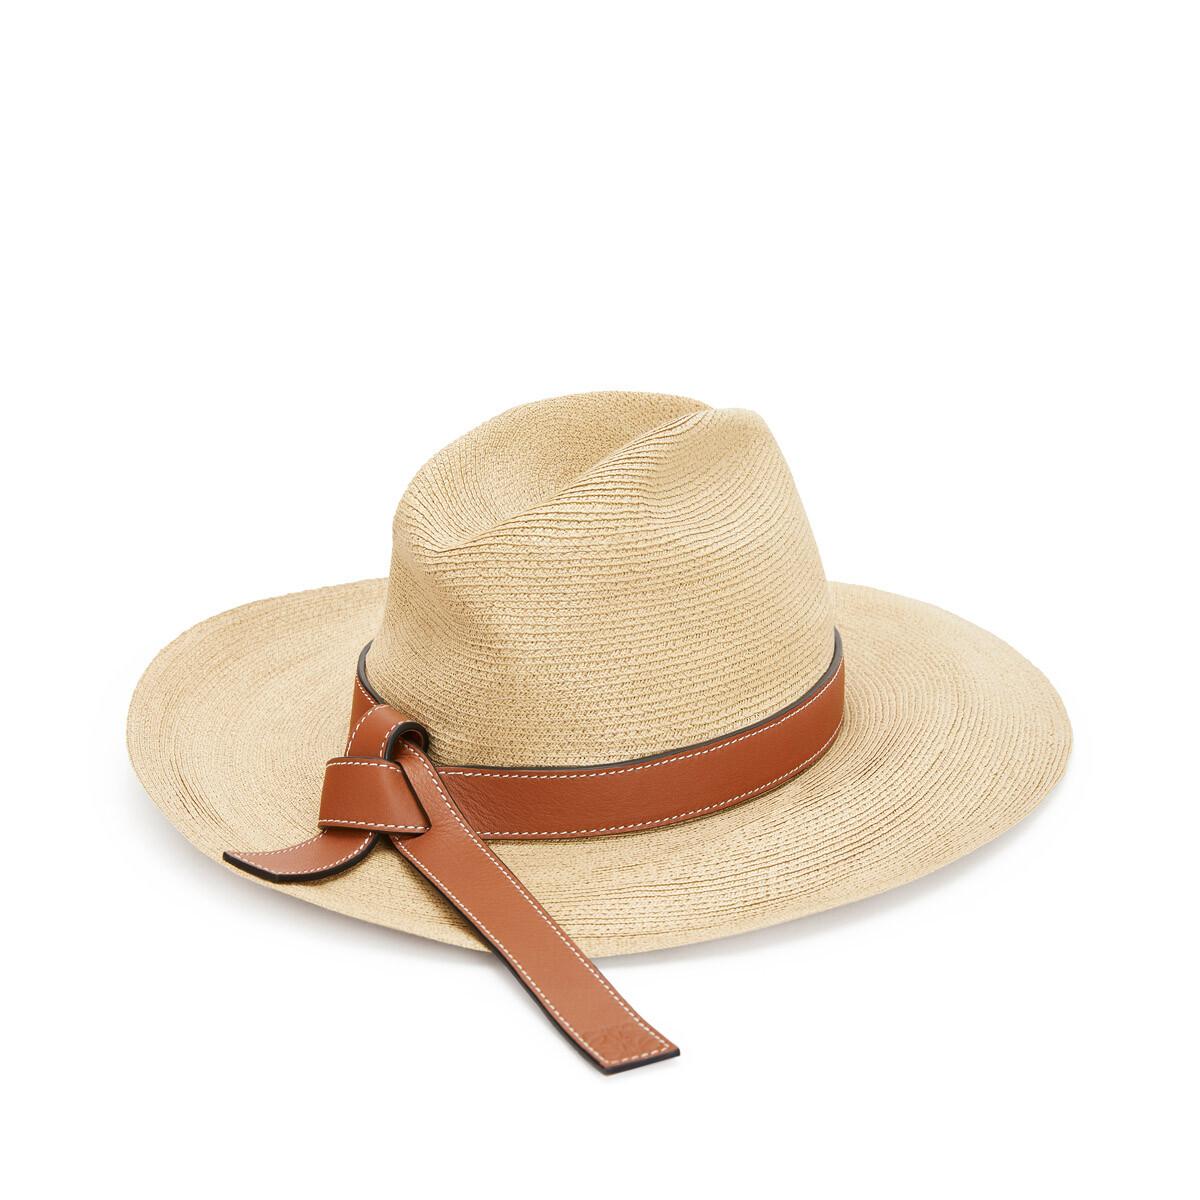 LOEWE Panama Hat 原色/棕褐色 front